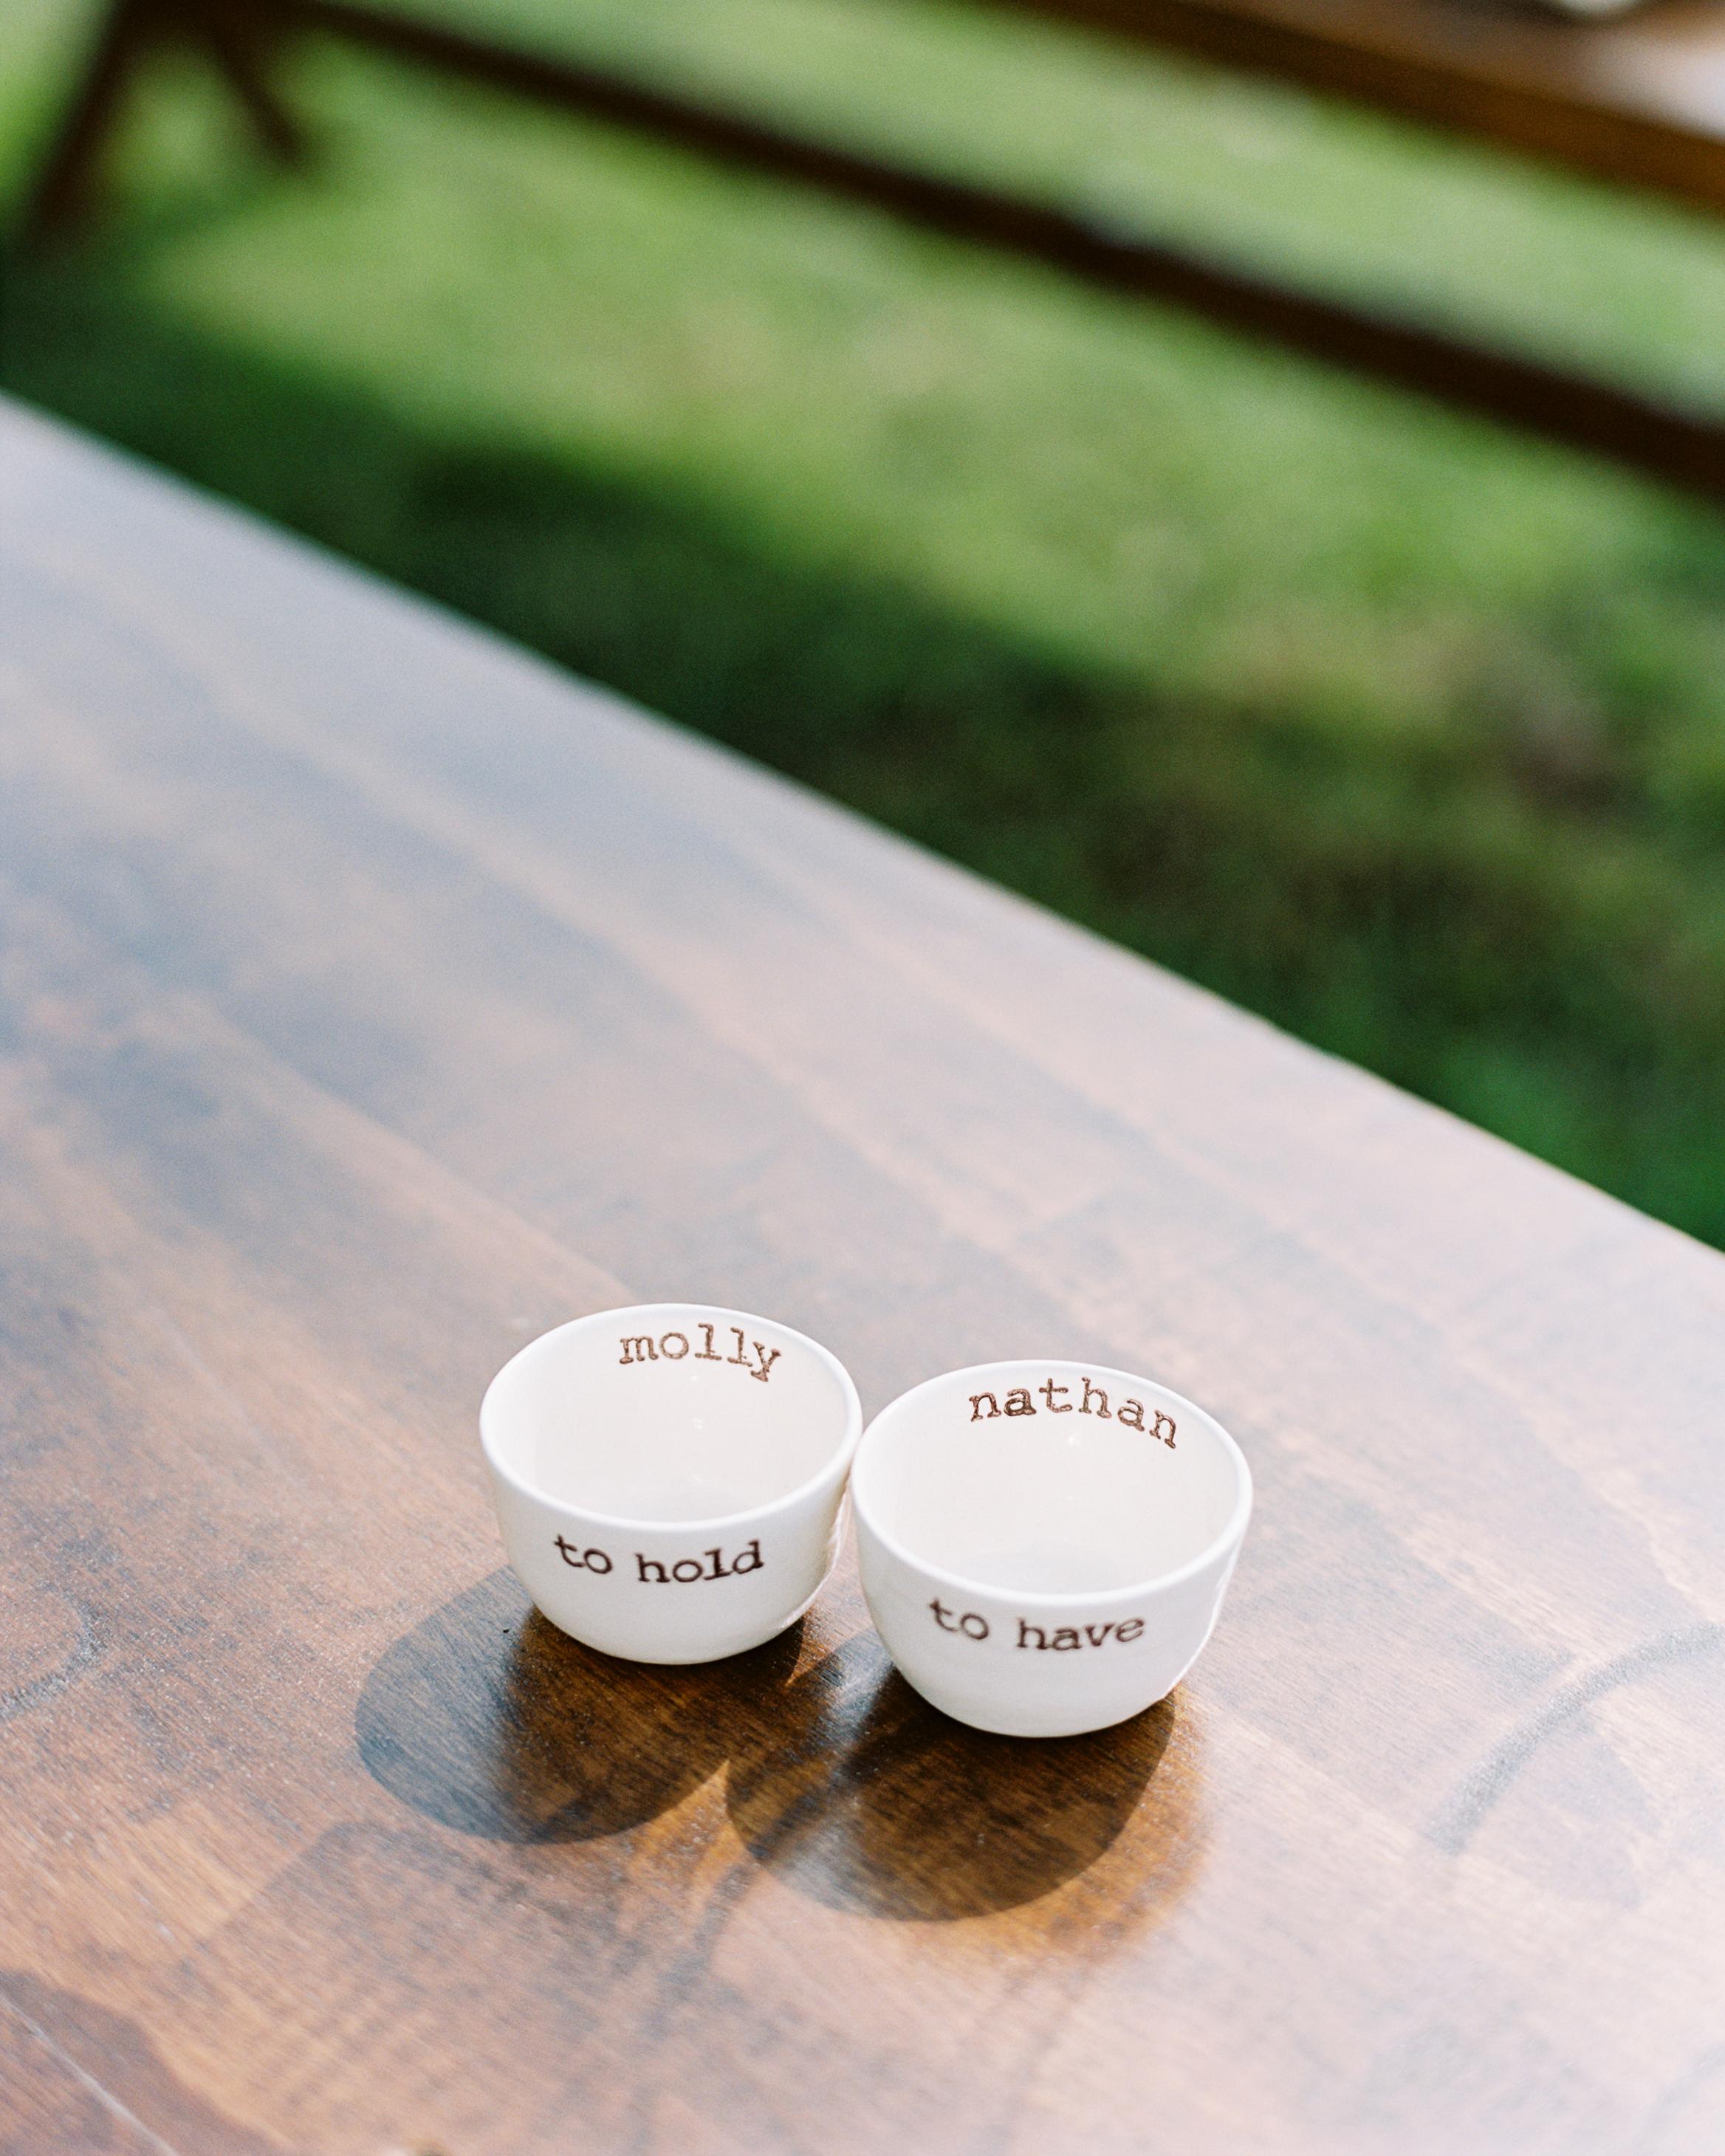 molly-nate-wedding-rings-035-s111479-0814.jpg